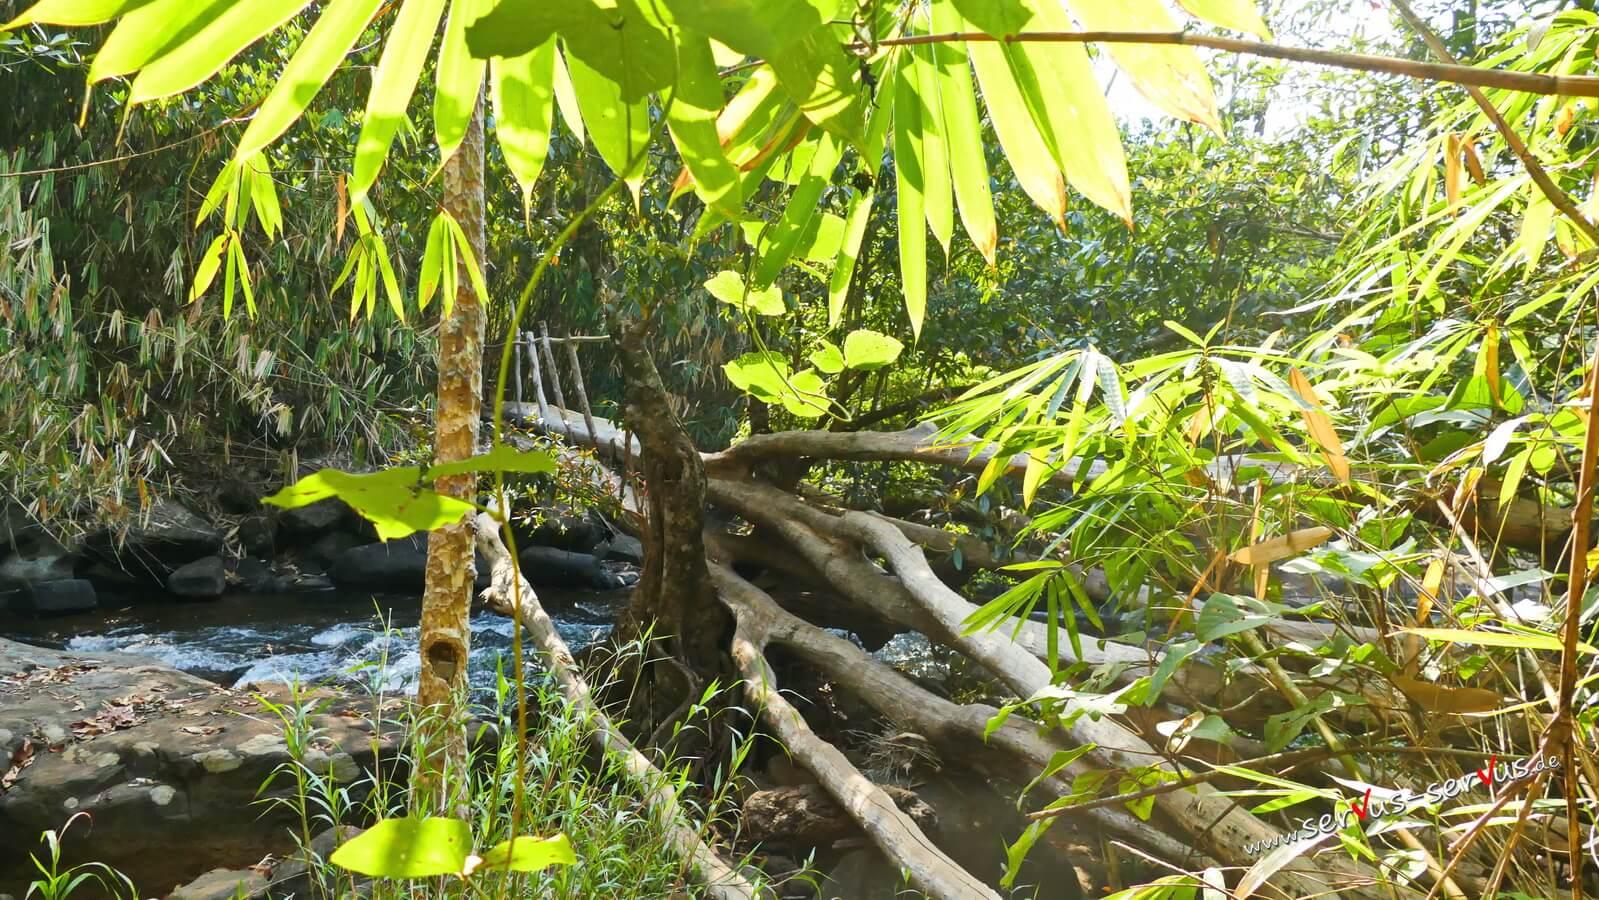 Steg im Dschungel, Laos